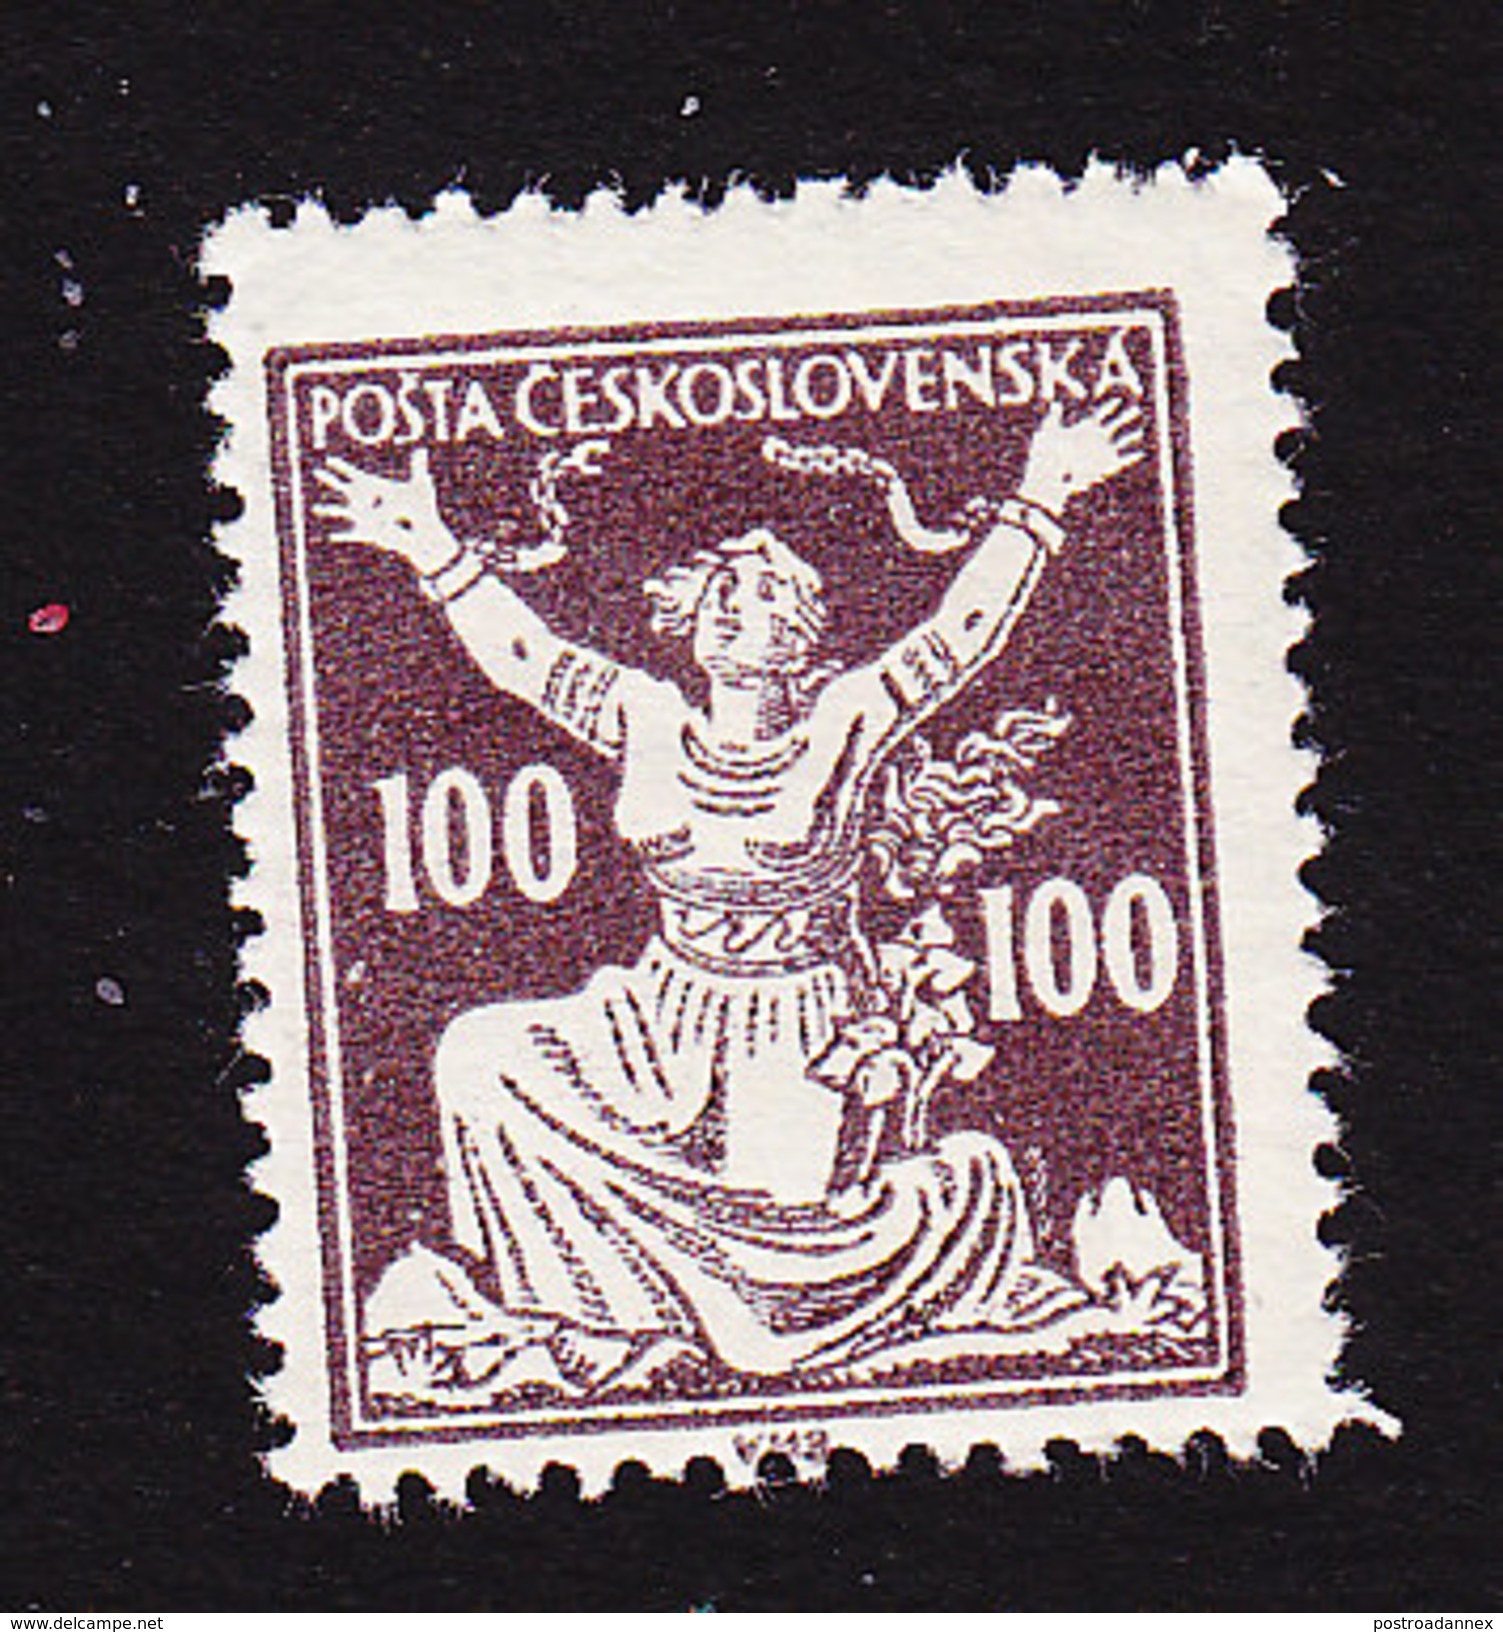 Czechoslovakia, Scott #88, Mint Hinged, Czechoslovakia Breaking Chains, Issued 1920 - Unused Stamps